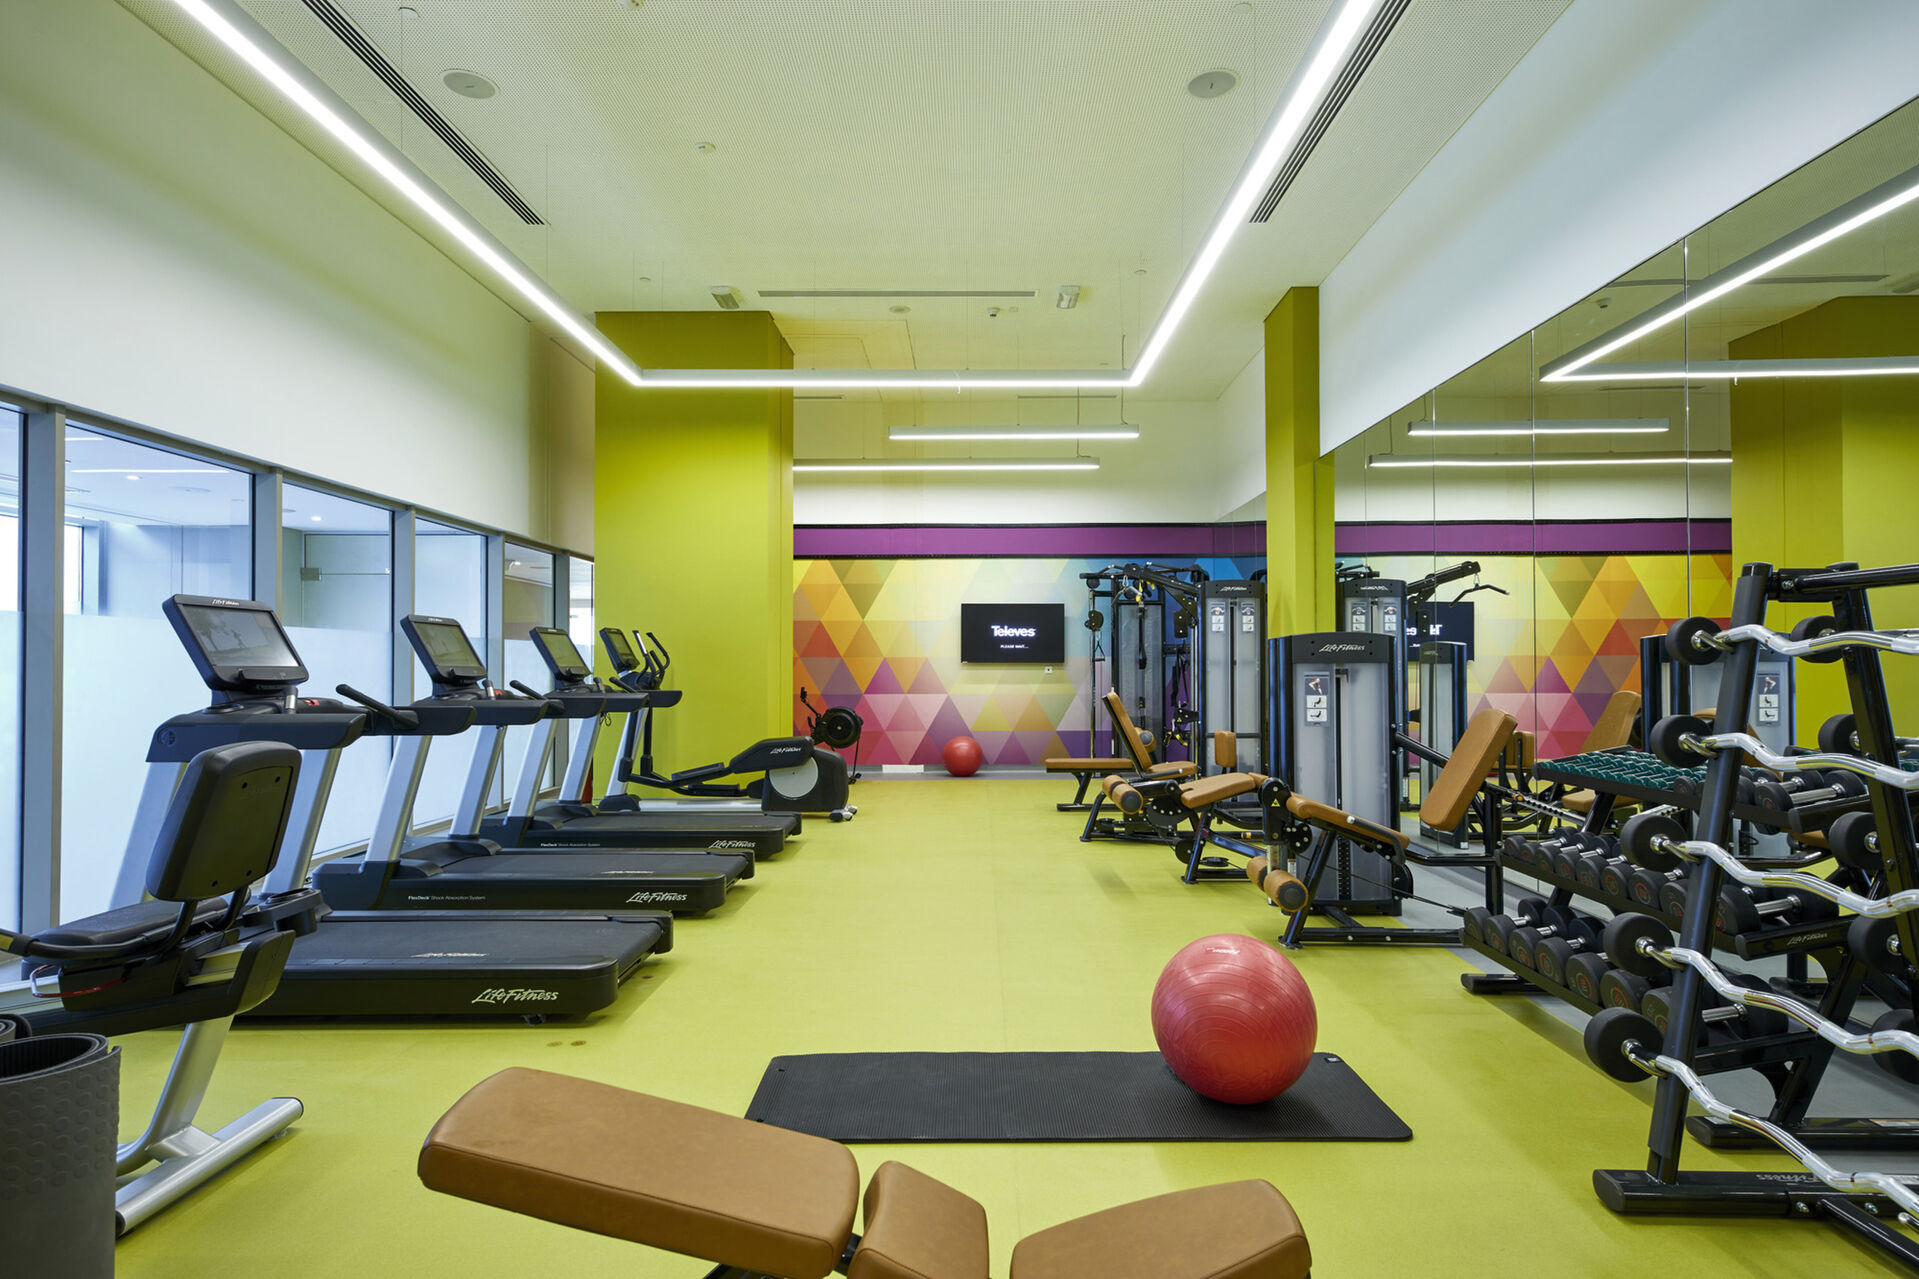 https://cms.satur.sk/data/imgs/tour_image/orig/dub_20_093-gym-1939873.jpg